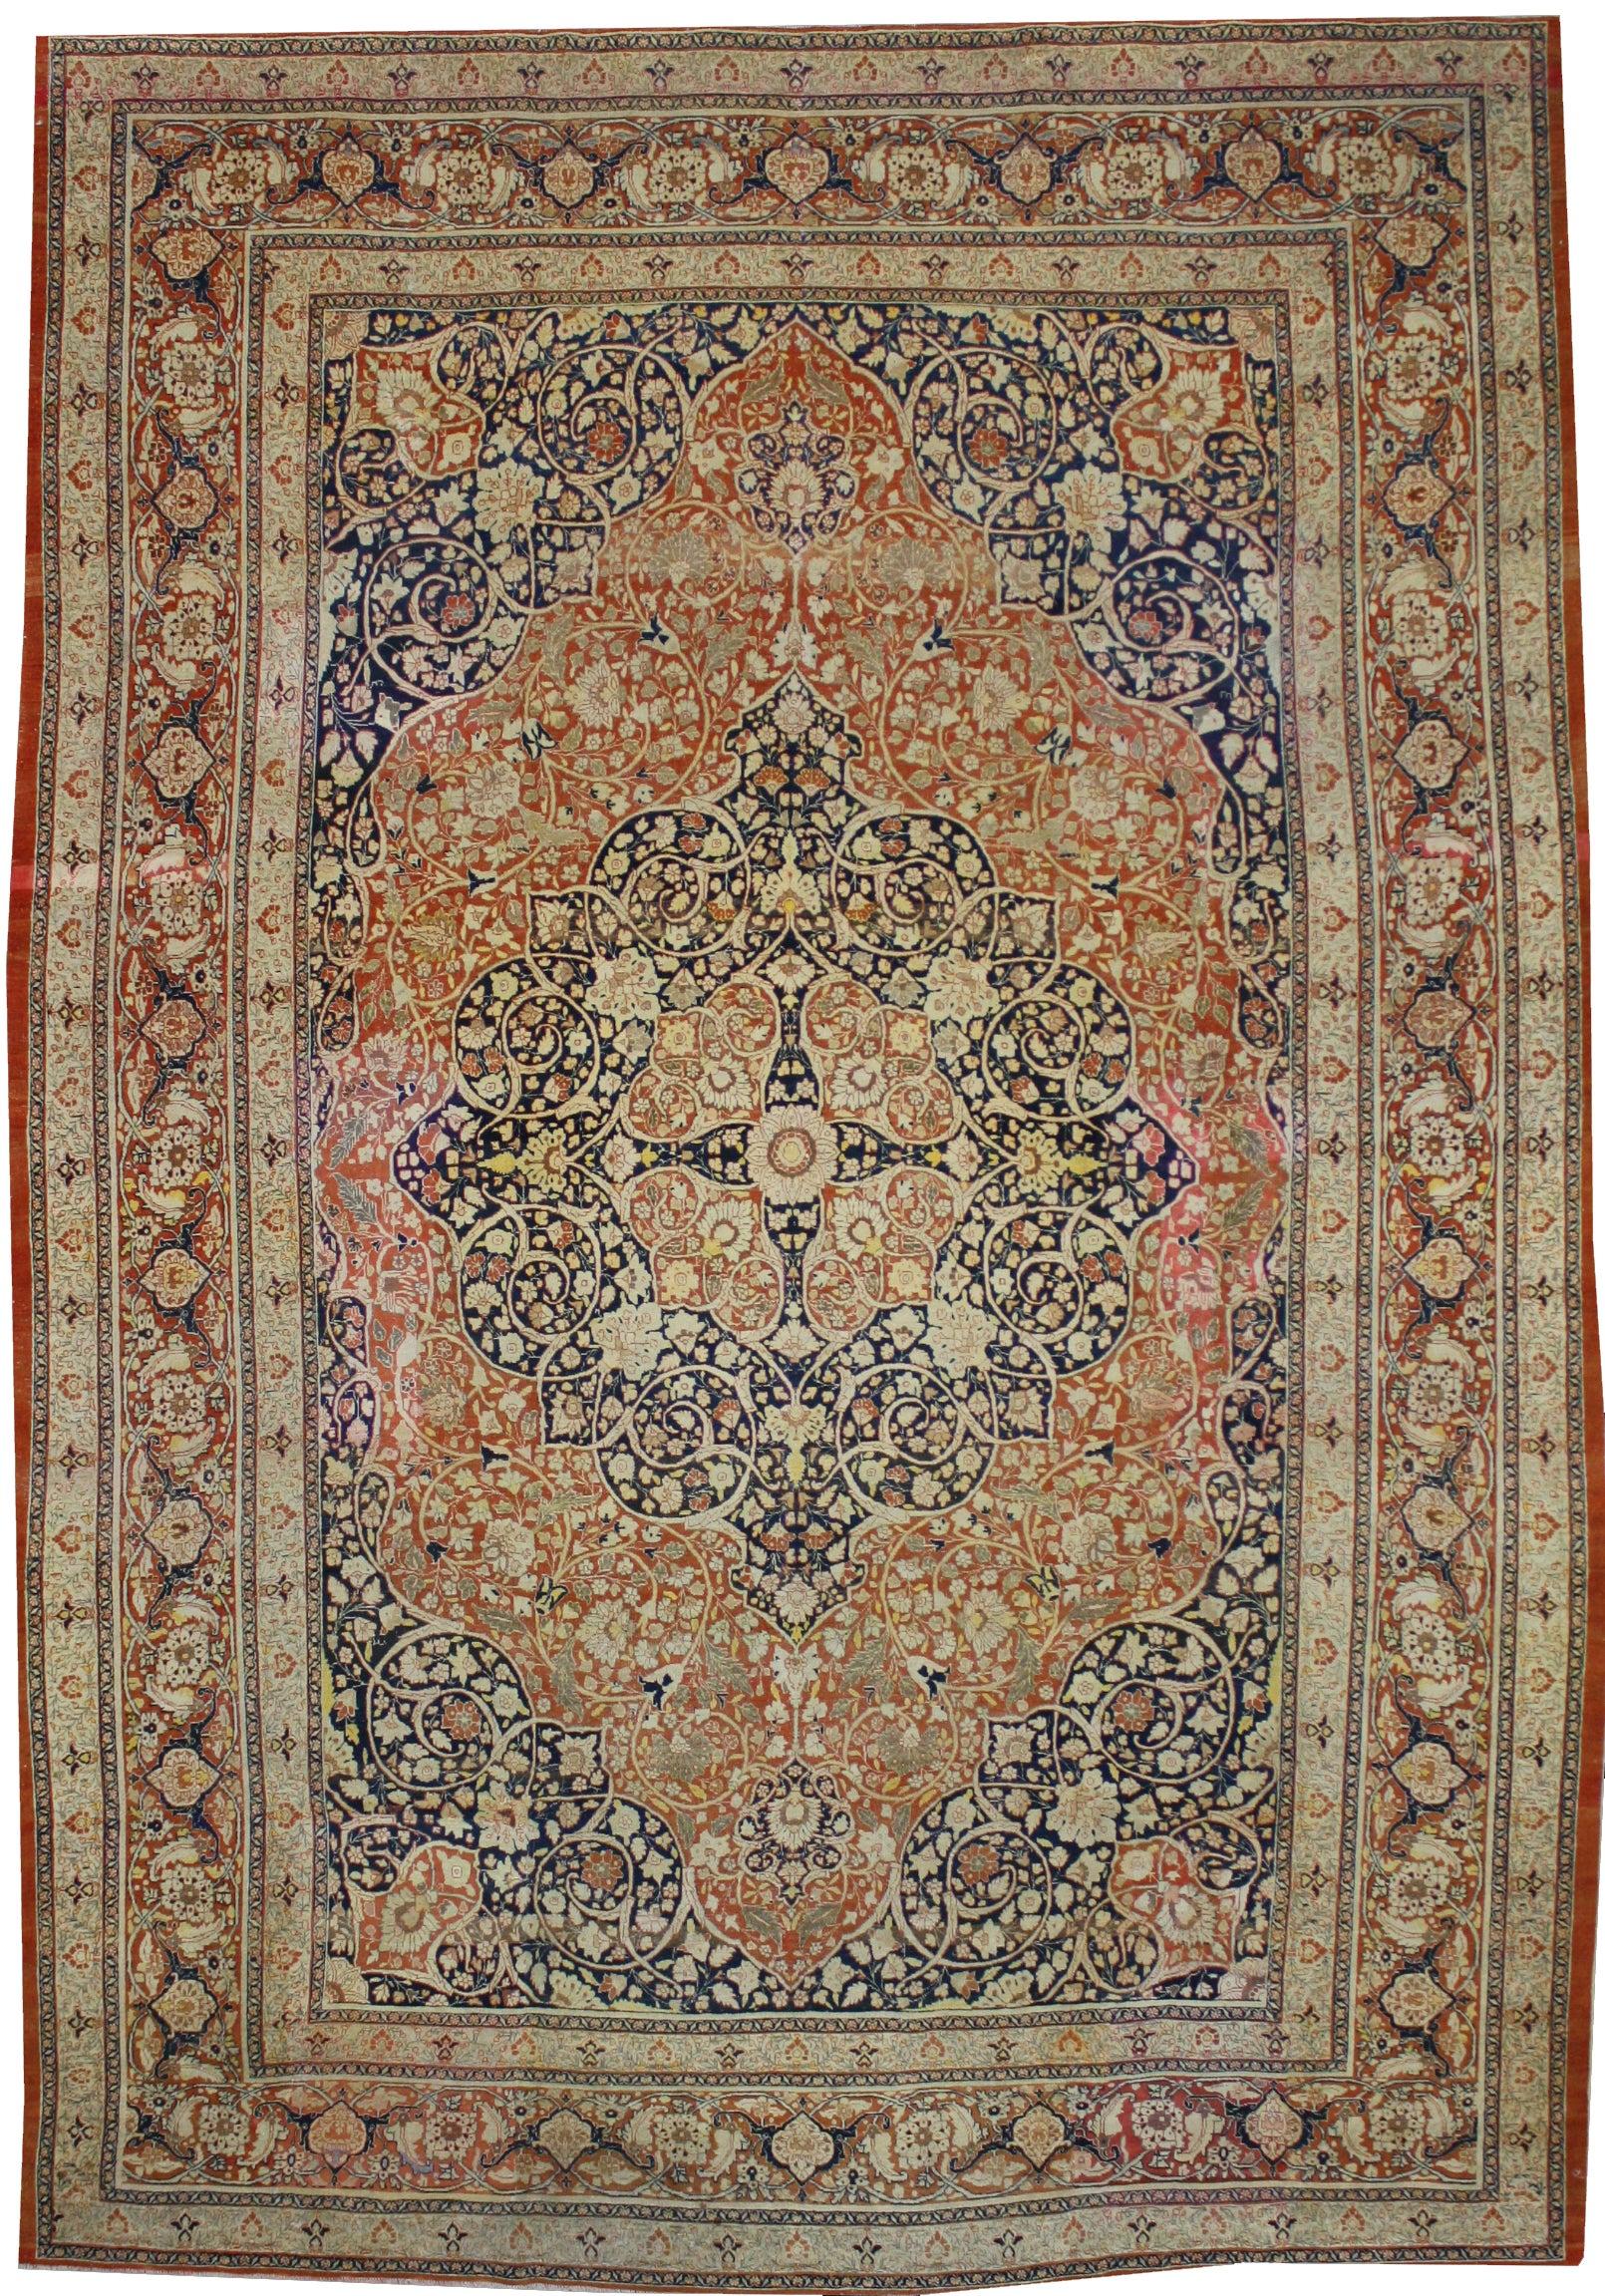 Haji Jalili Antique Persian Tabriz Rug with Art Nouveau Style